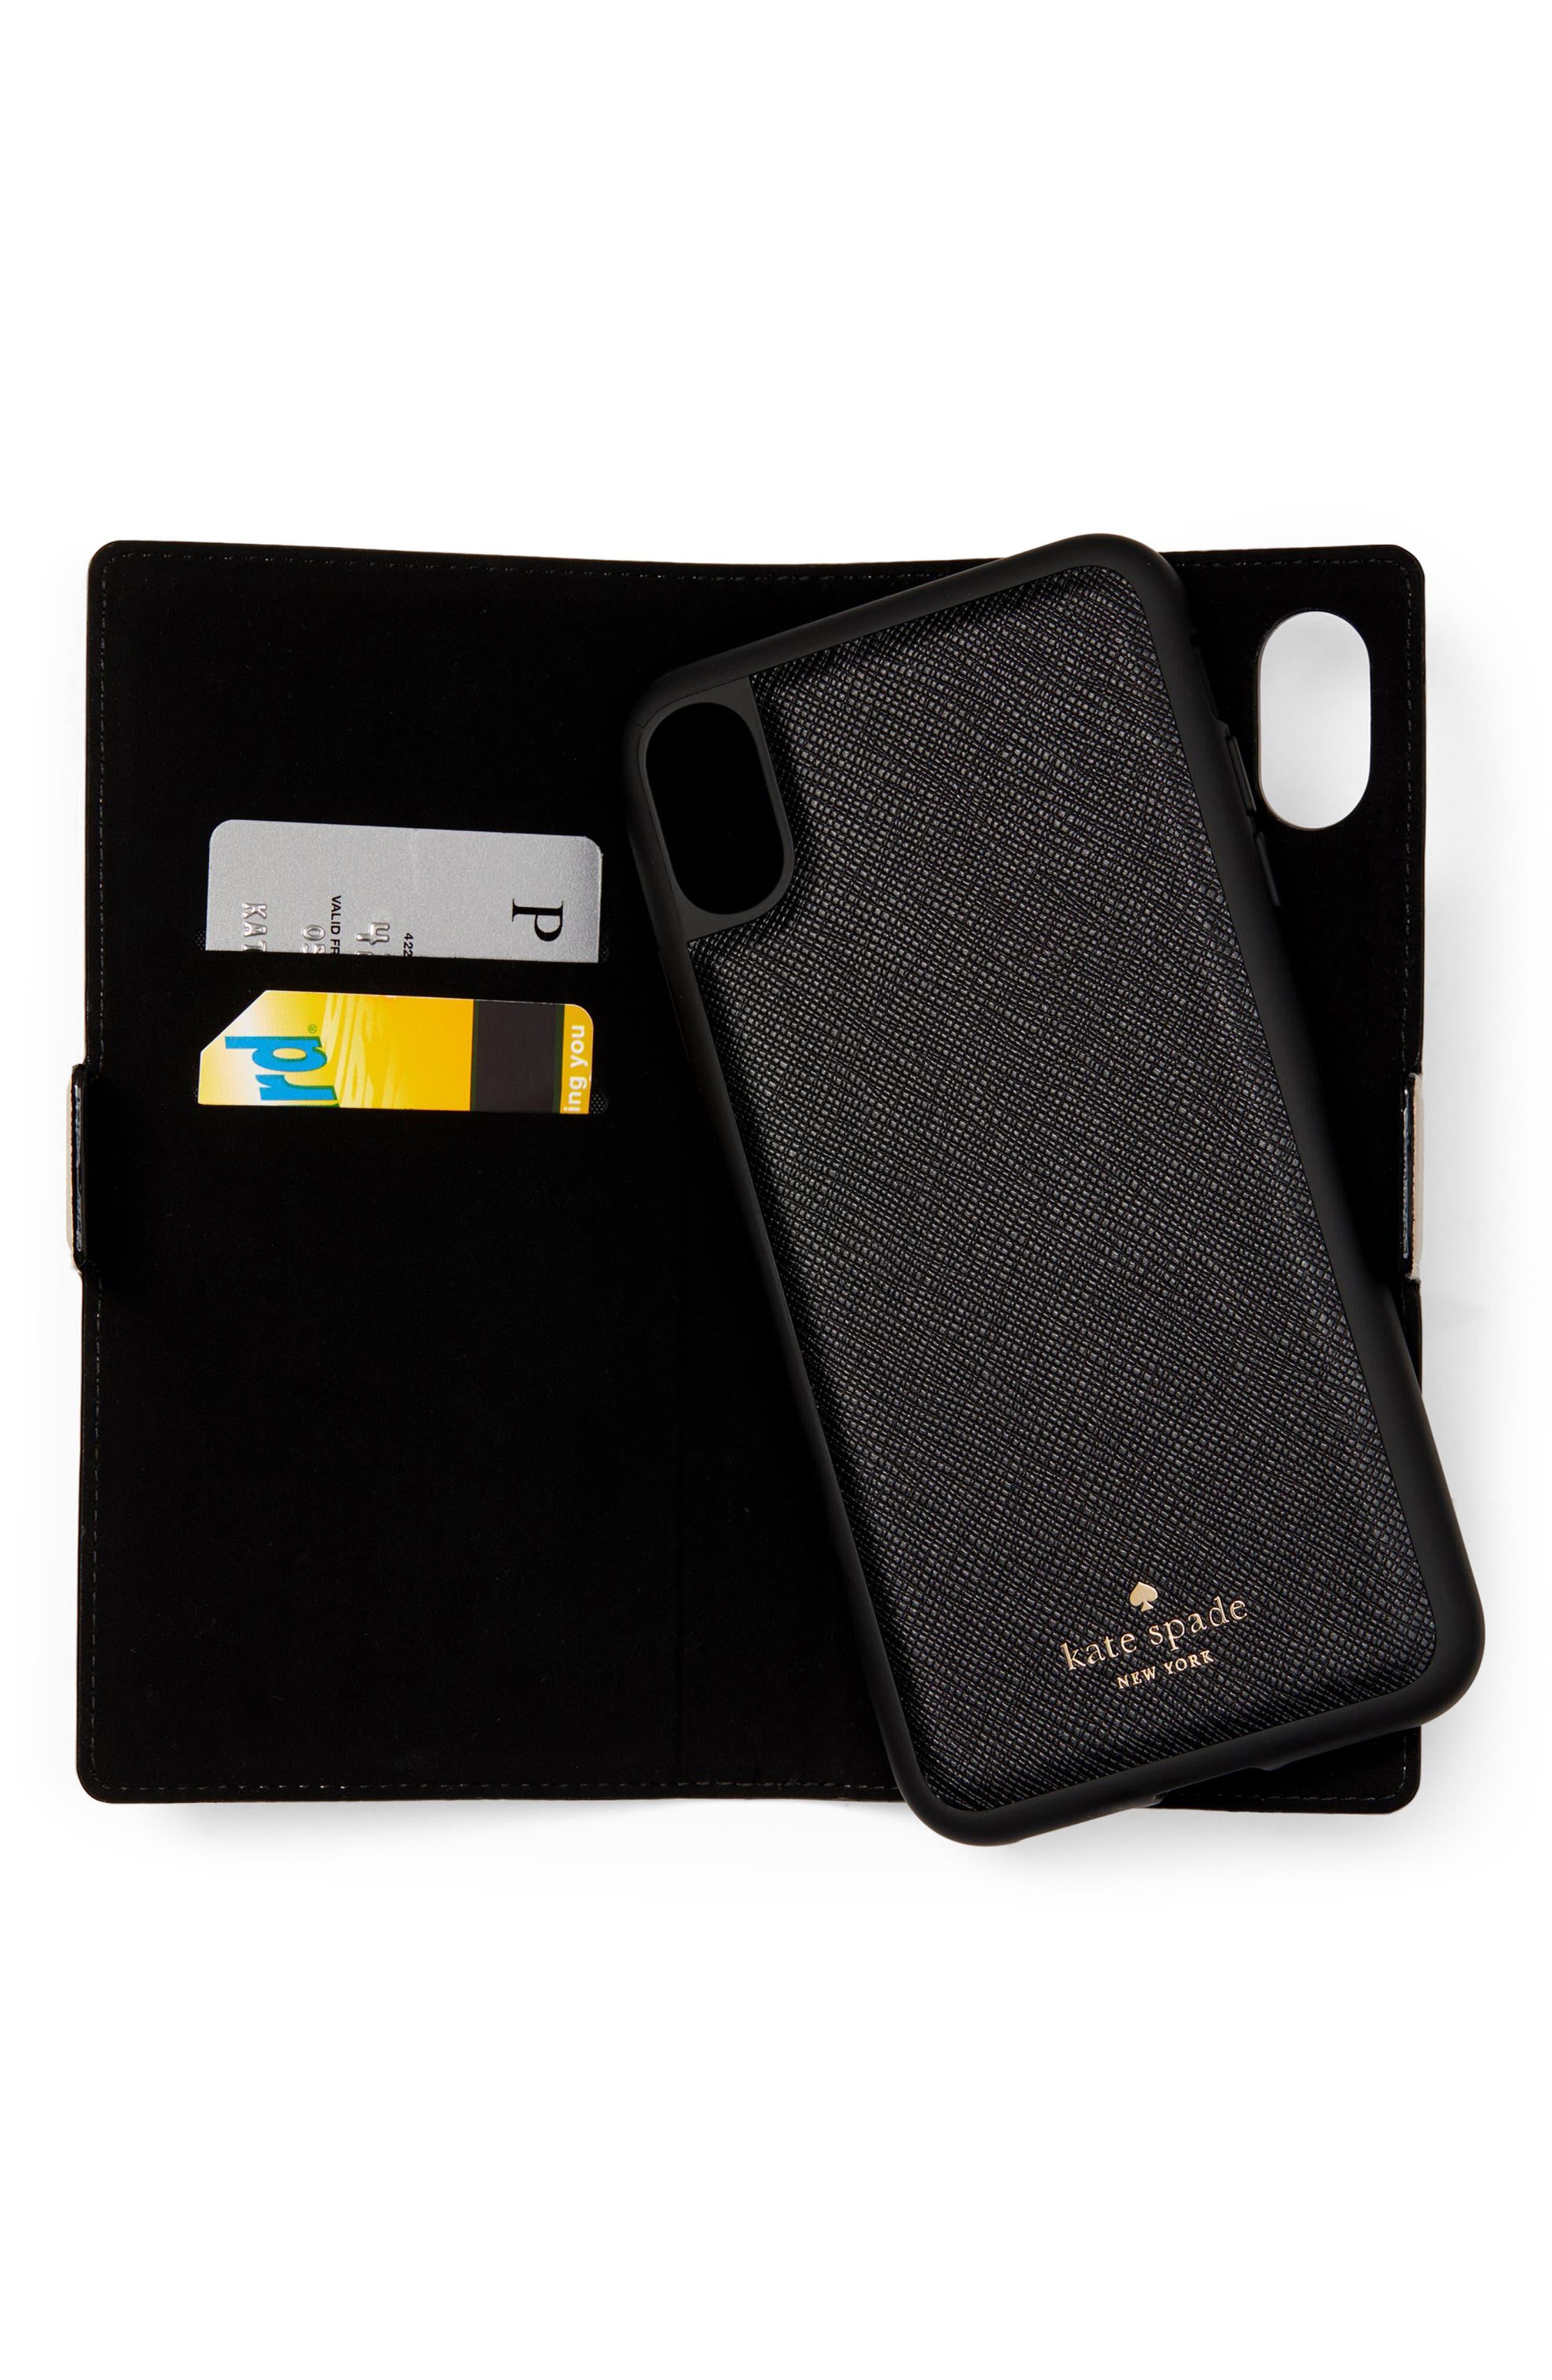 KATE SPADE NEW YORK,                             iPhone X/Xs/Xs Max & XR magnetic wrap folio case,                             Alternate thumbnail 5, color,                             BLACK/ TUSK